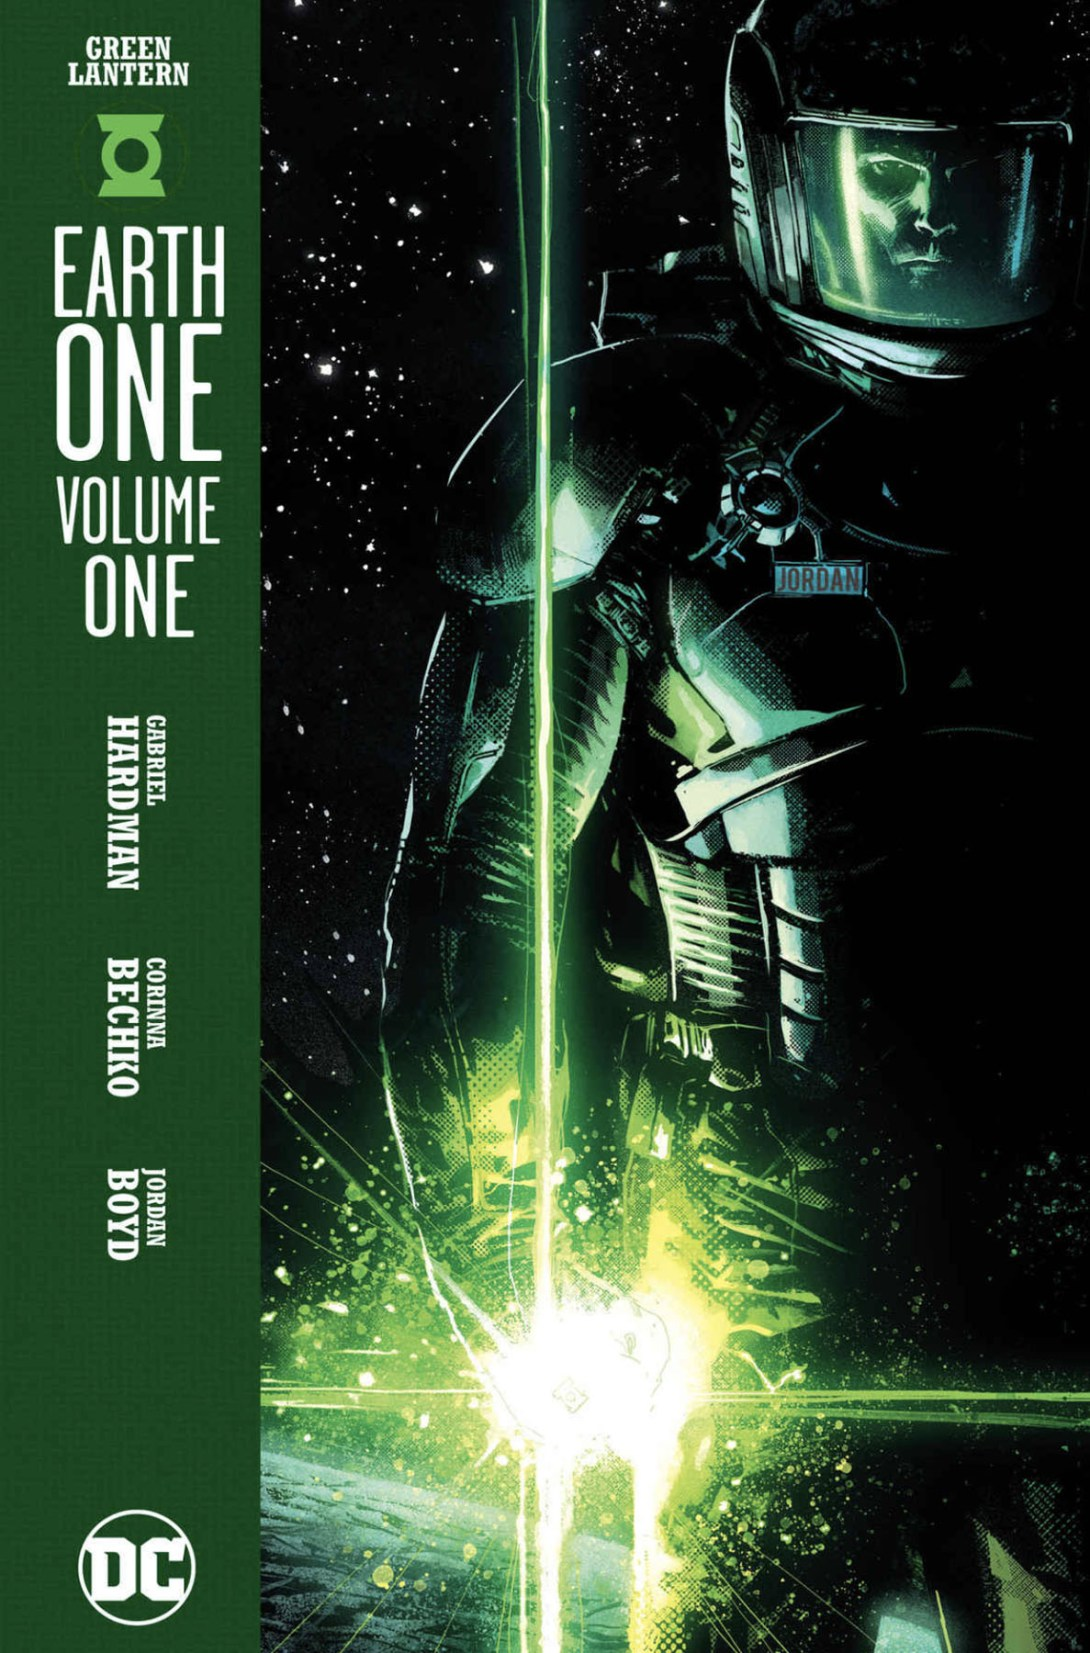 Green Lantern Earth One - DC Comics News